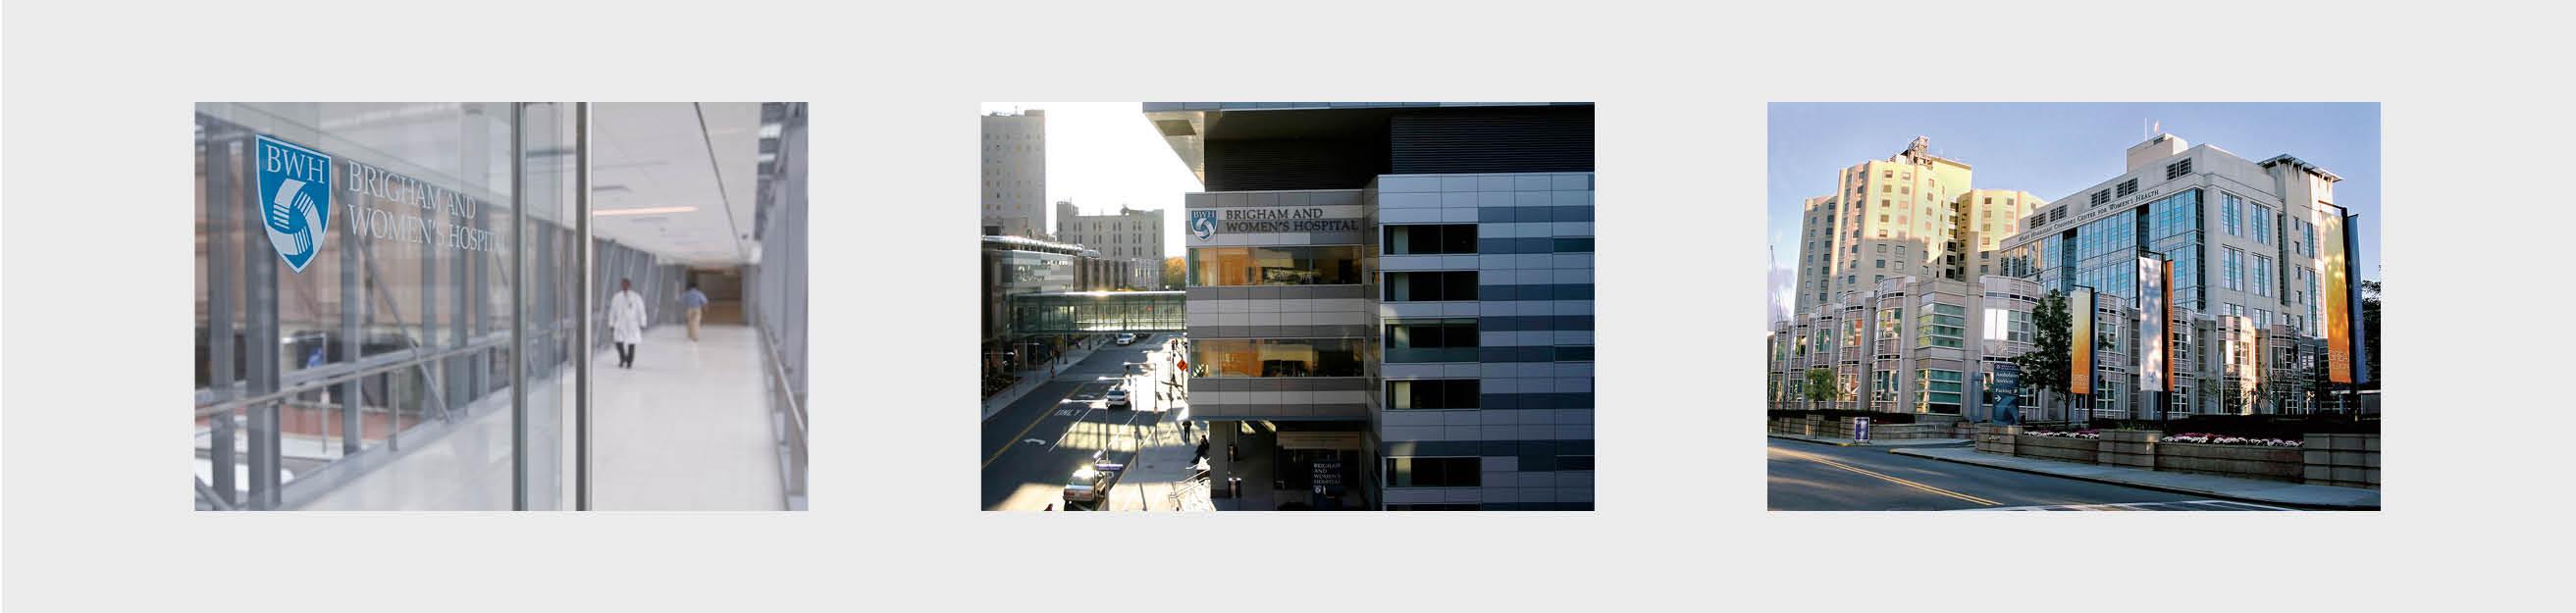 Brigham-and-Womens-Hospital-Boston